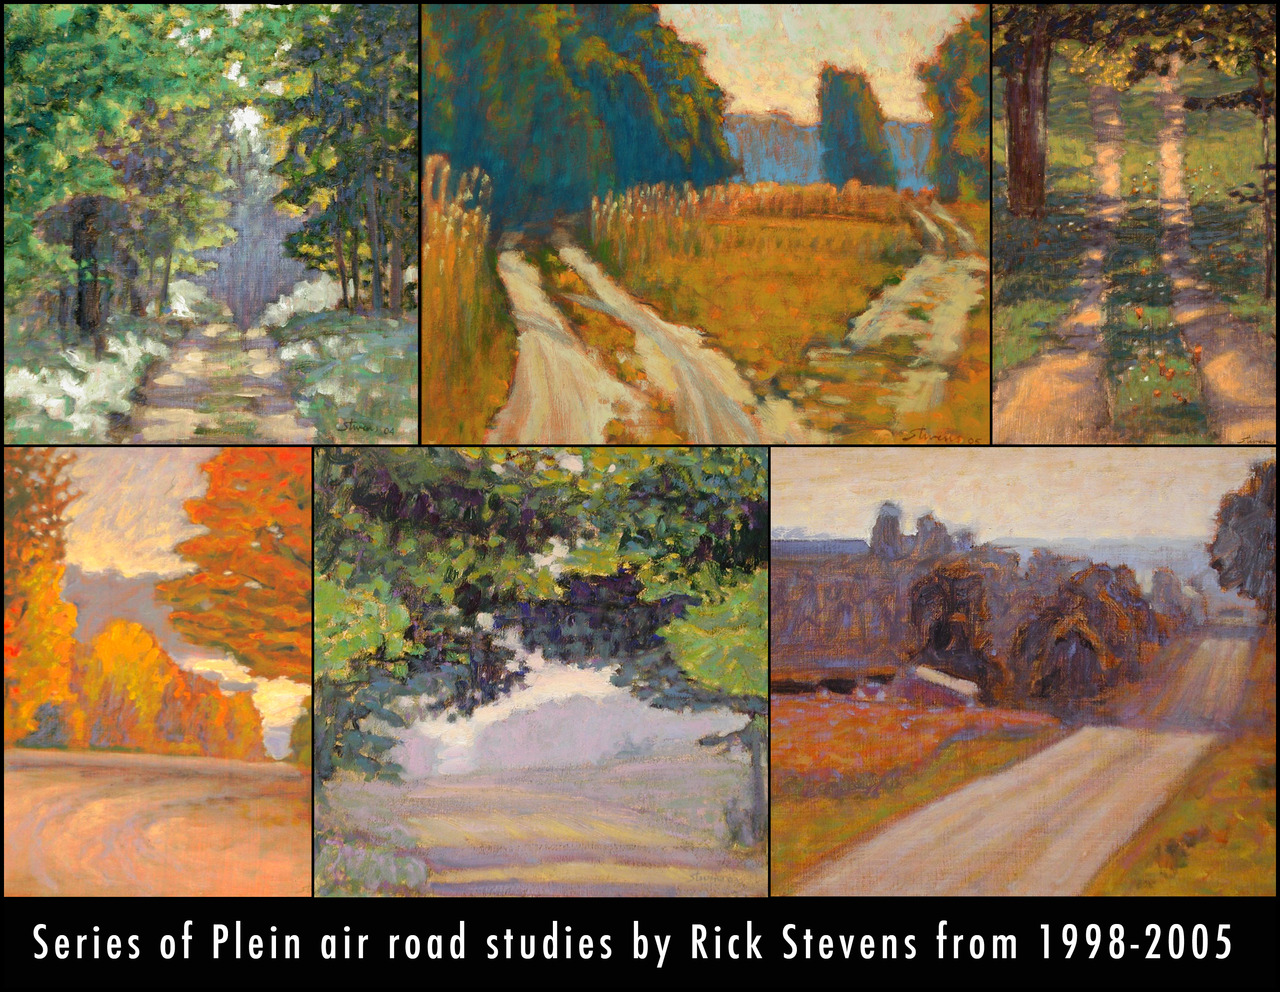 Series of Plein Air road studies from 1998-2005      more retrospective work